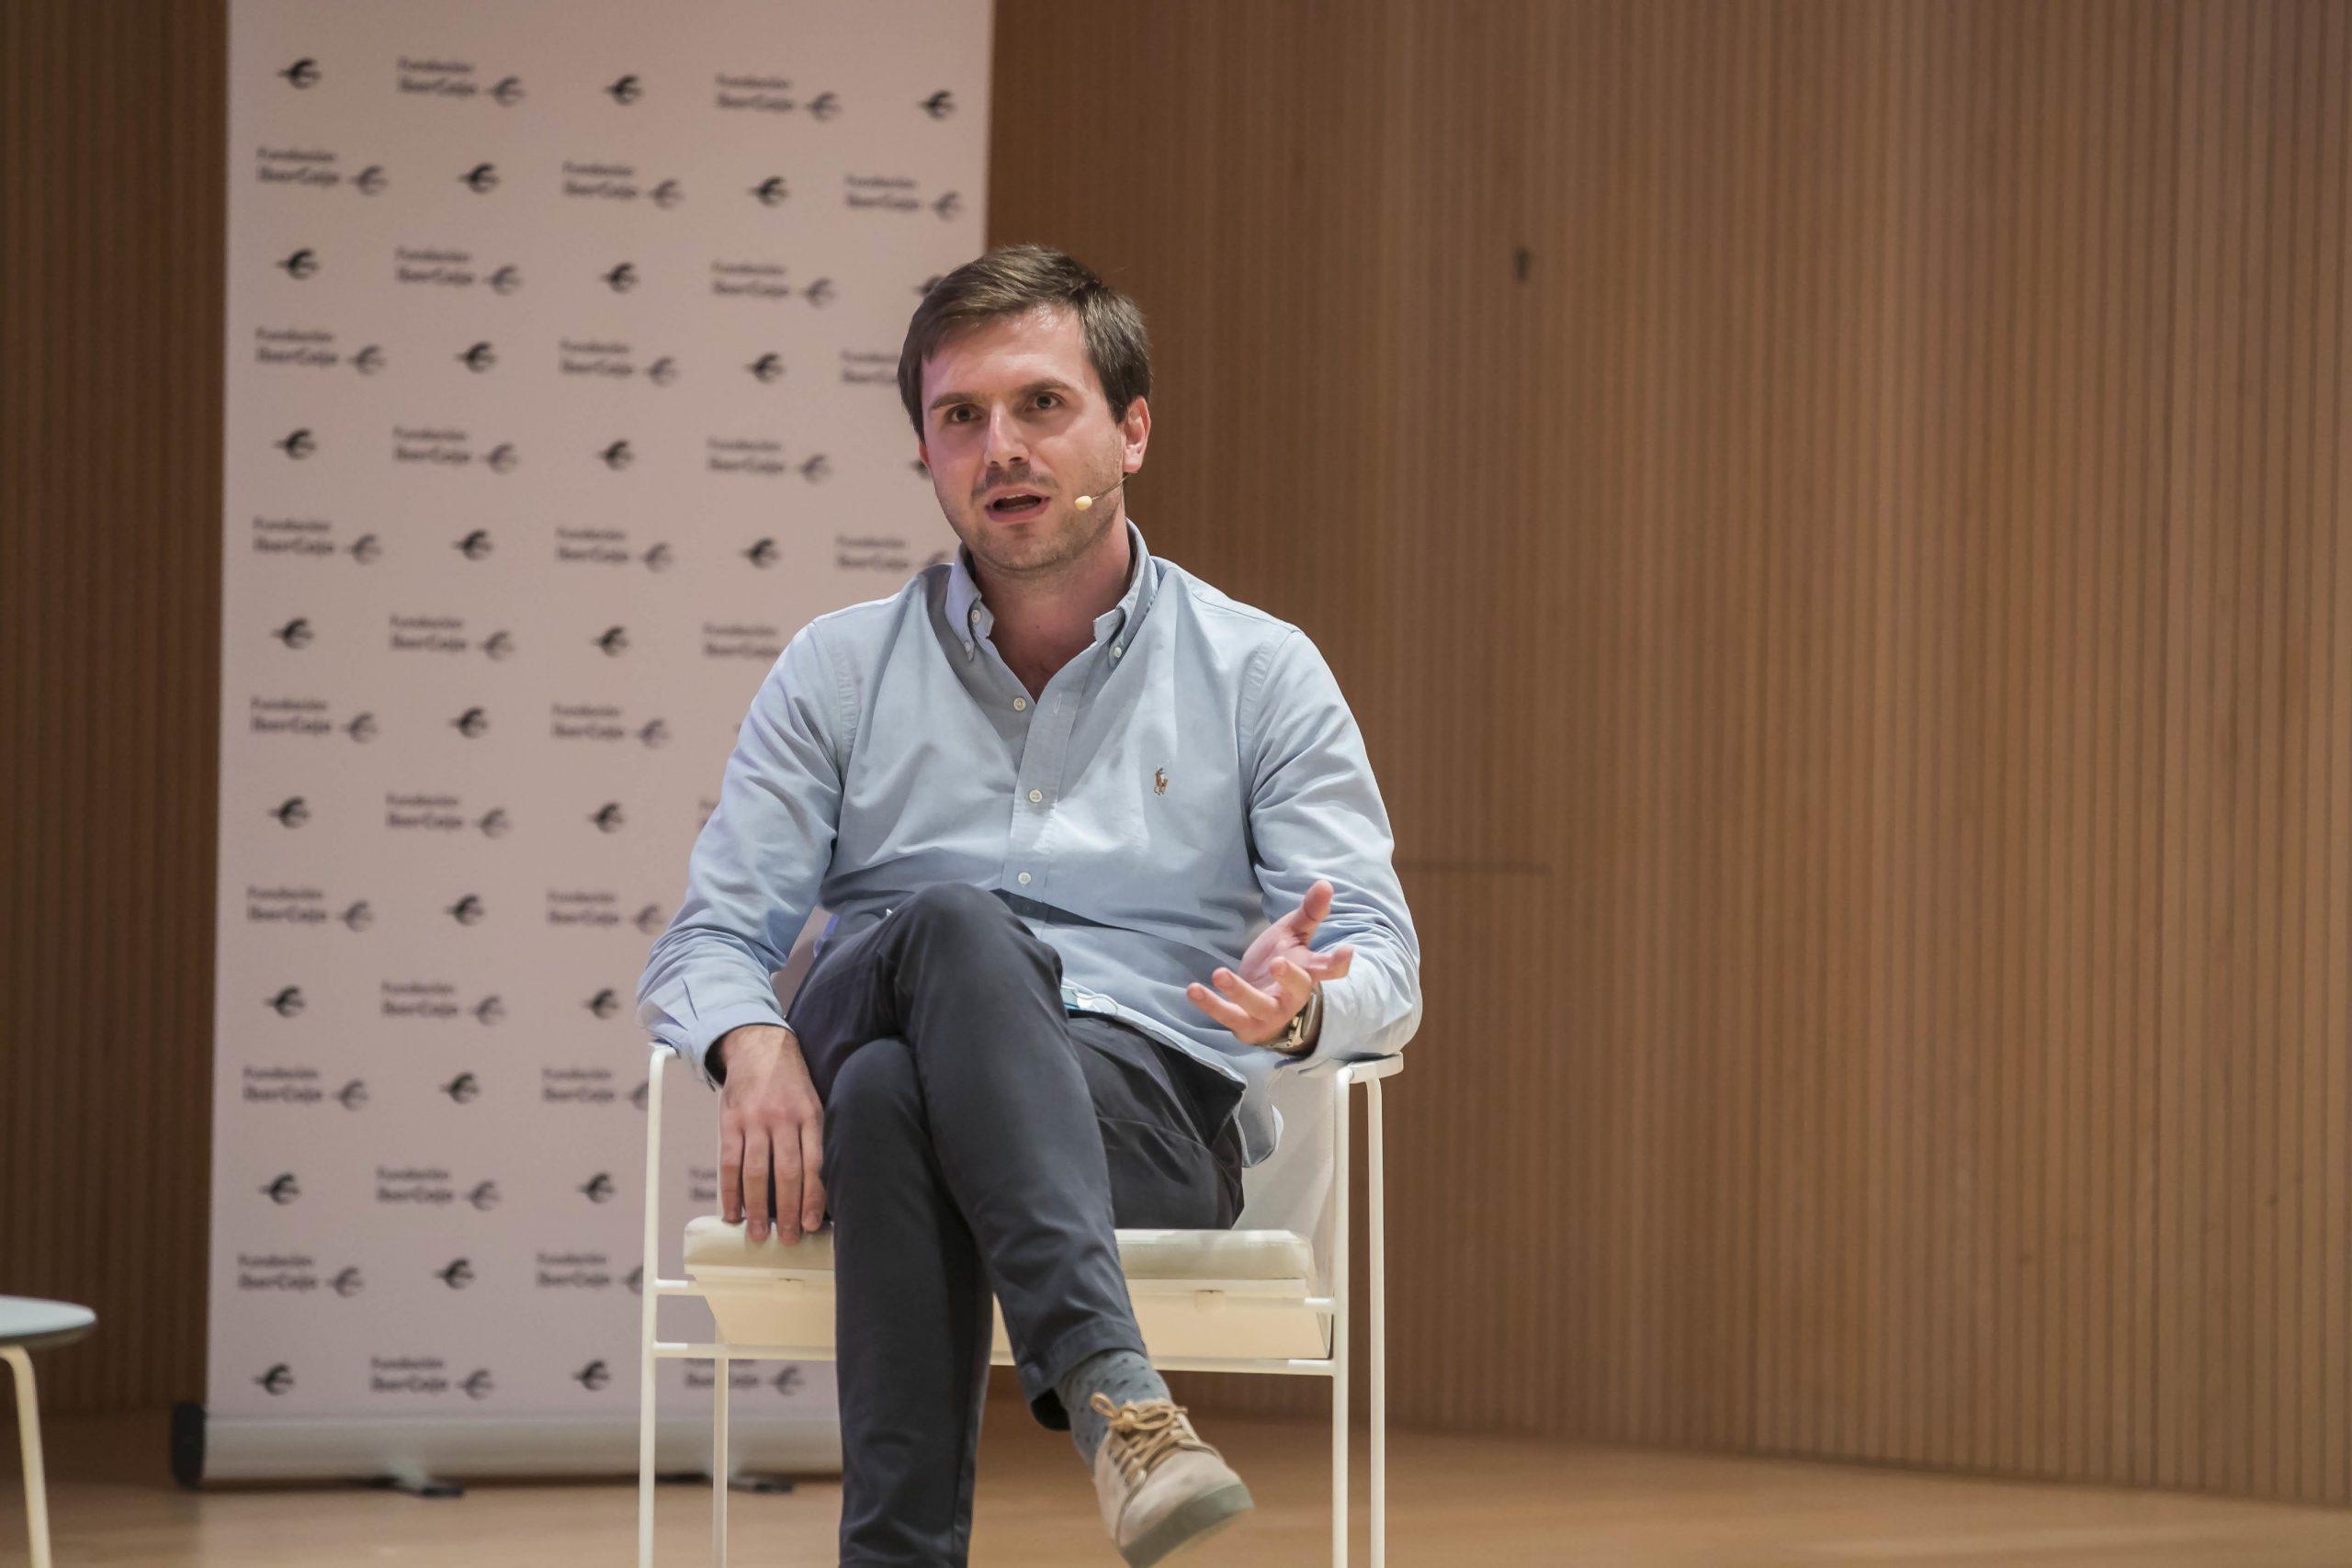 Carlos Paúl